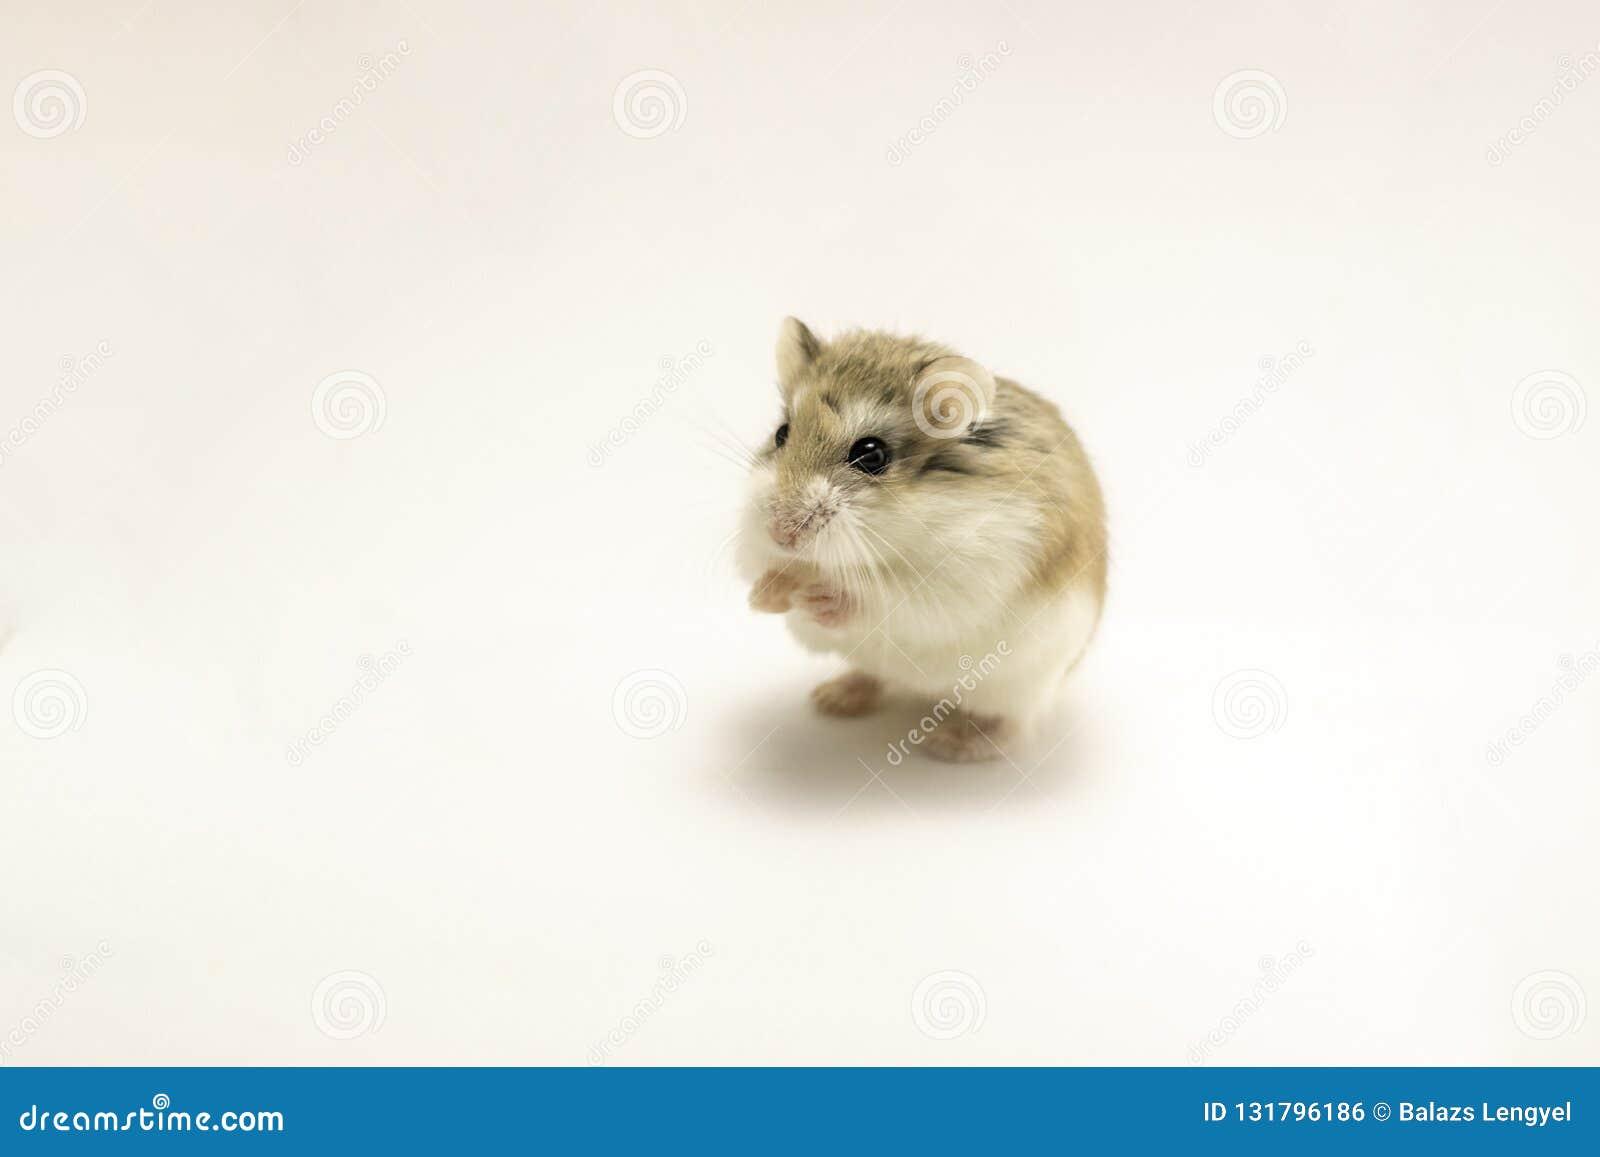 Roborovski Hamster Isolated On White Background Stock Photo